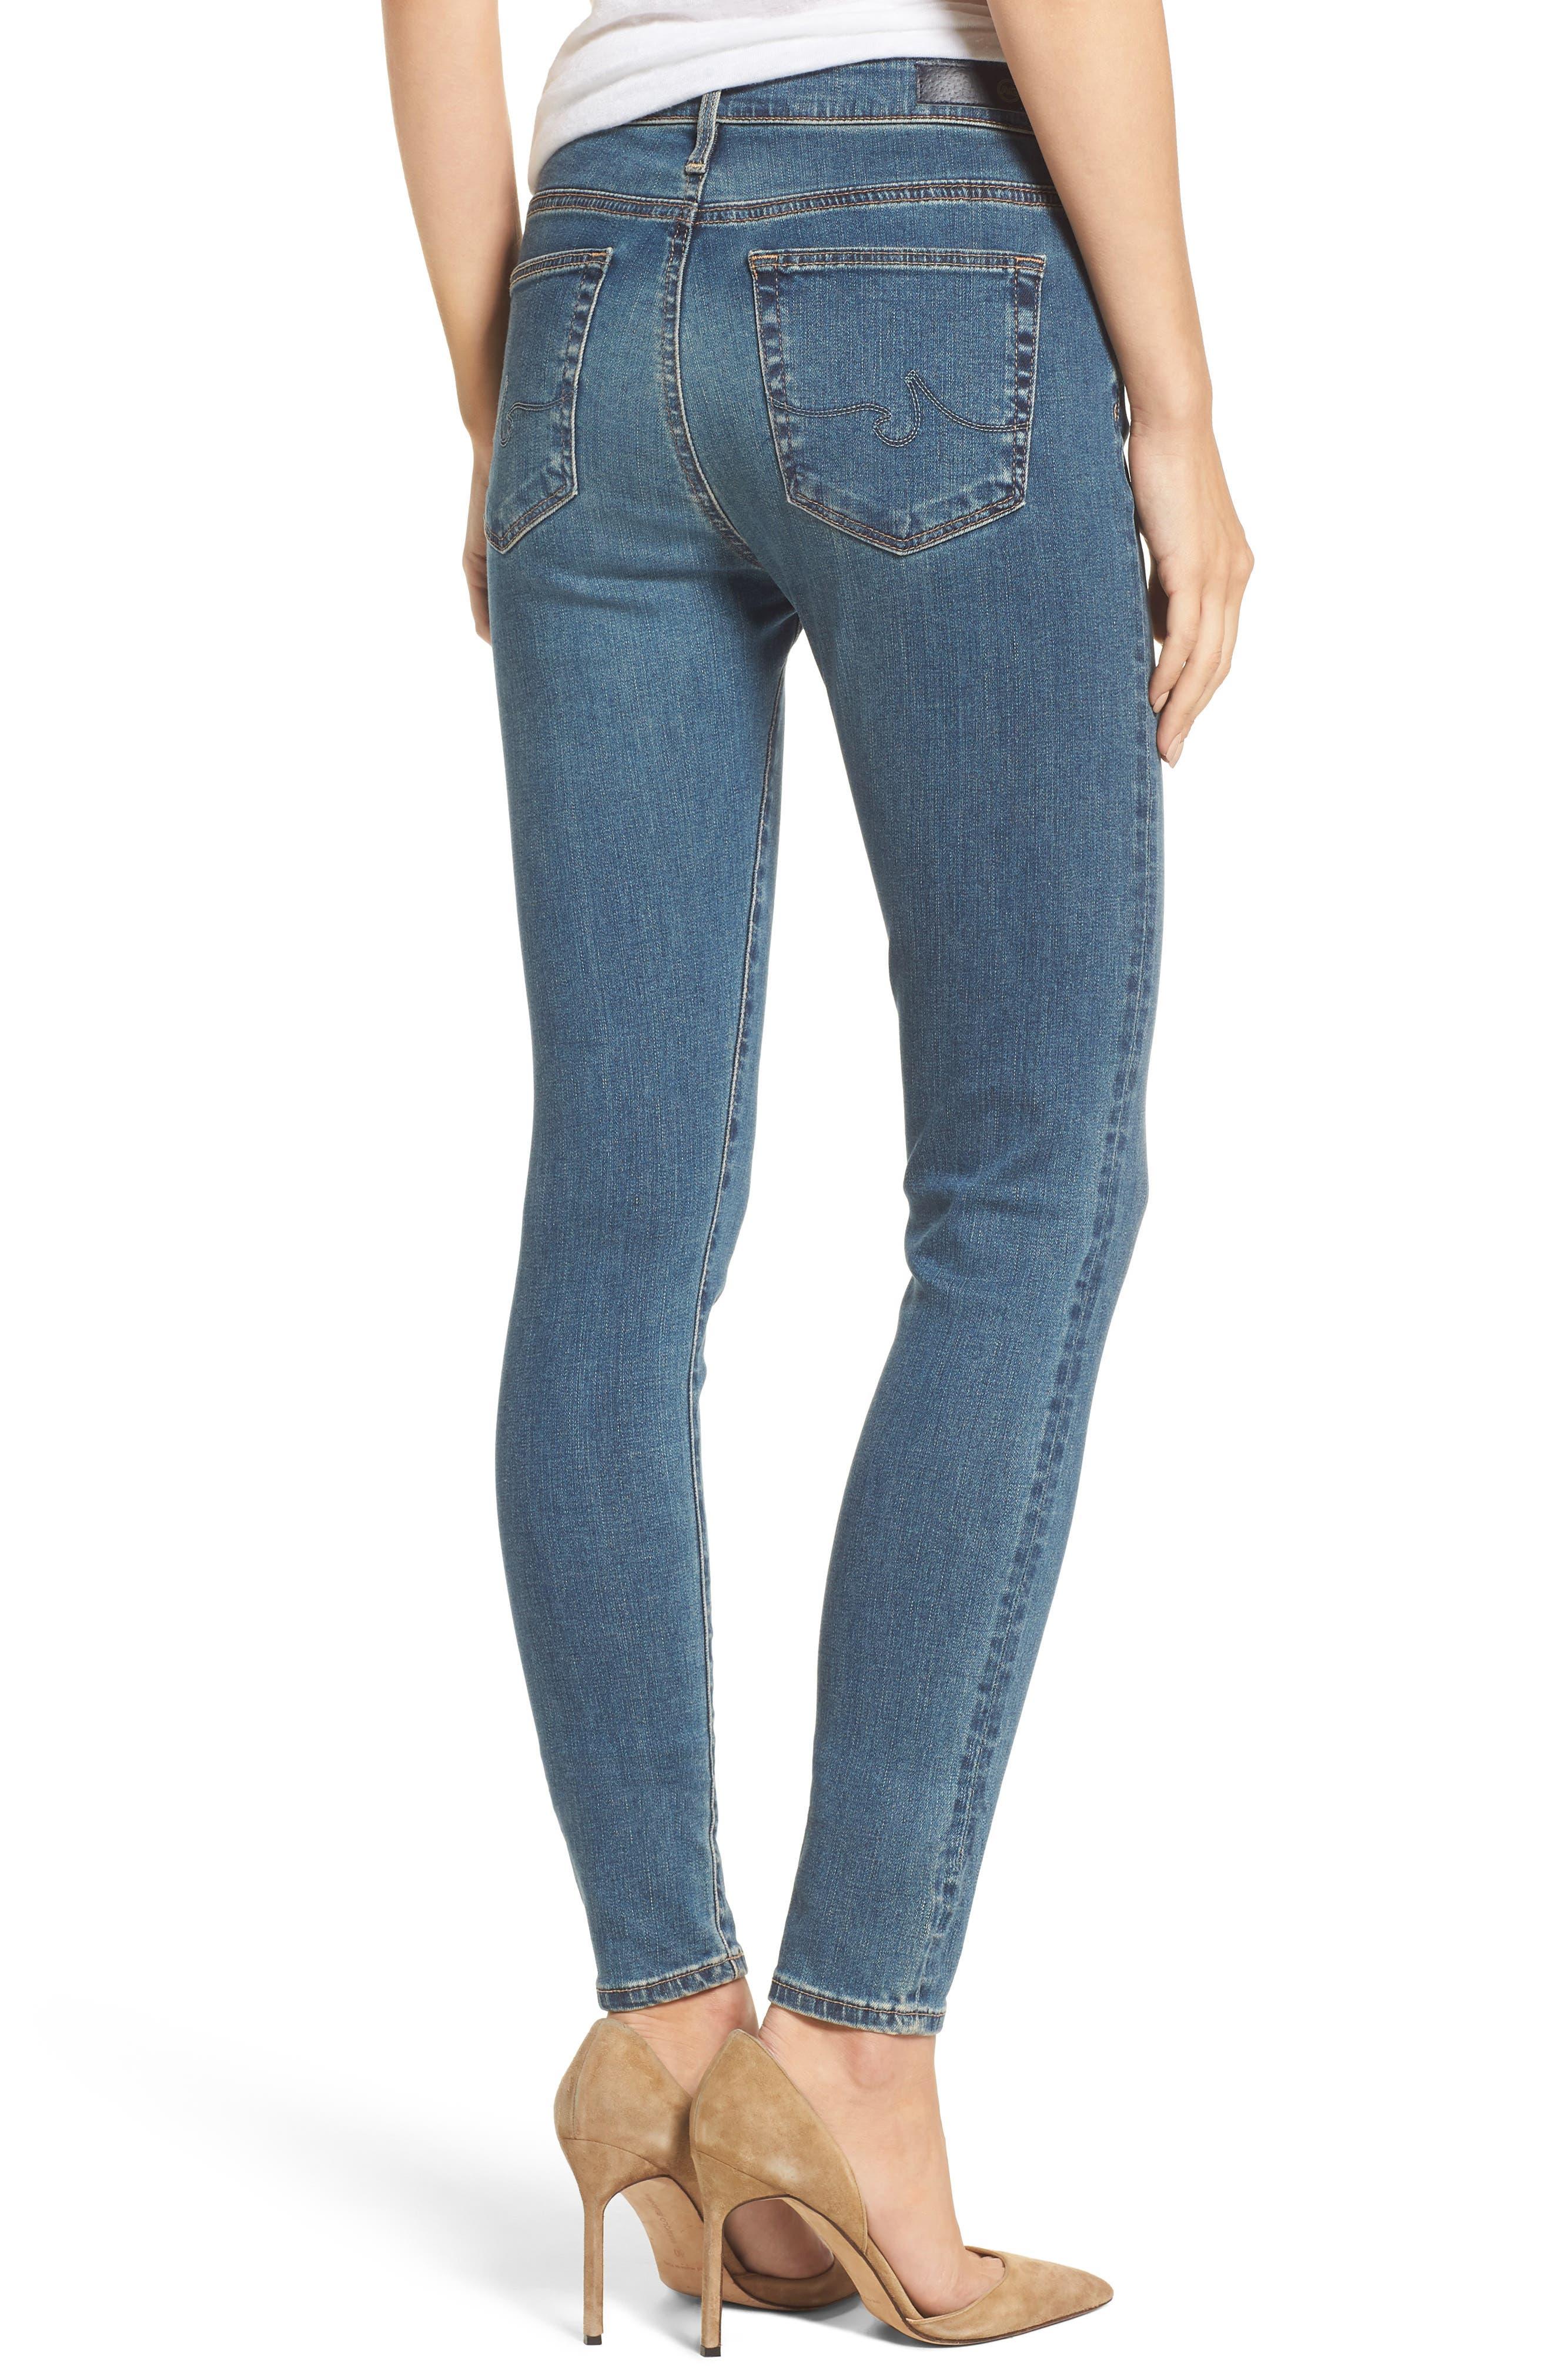 'The Farrah' High Rise Skinny Jeans,                             Alternate thumbnail 15, color,